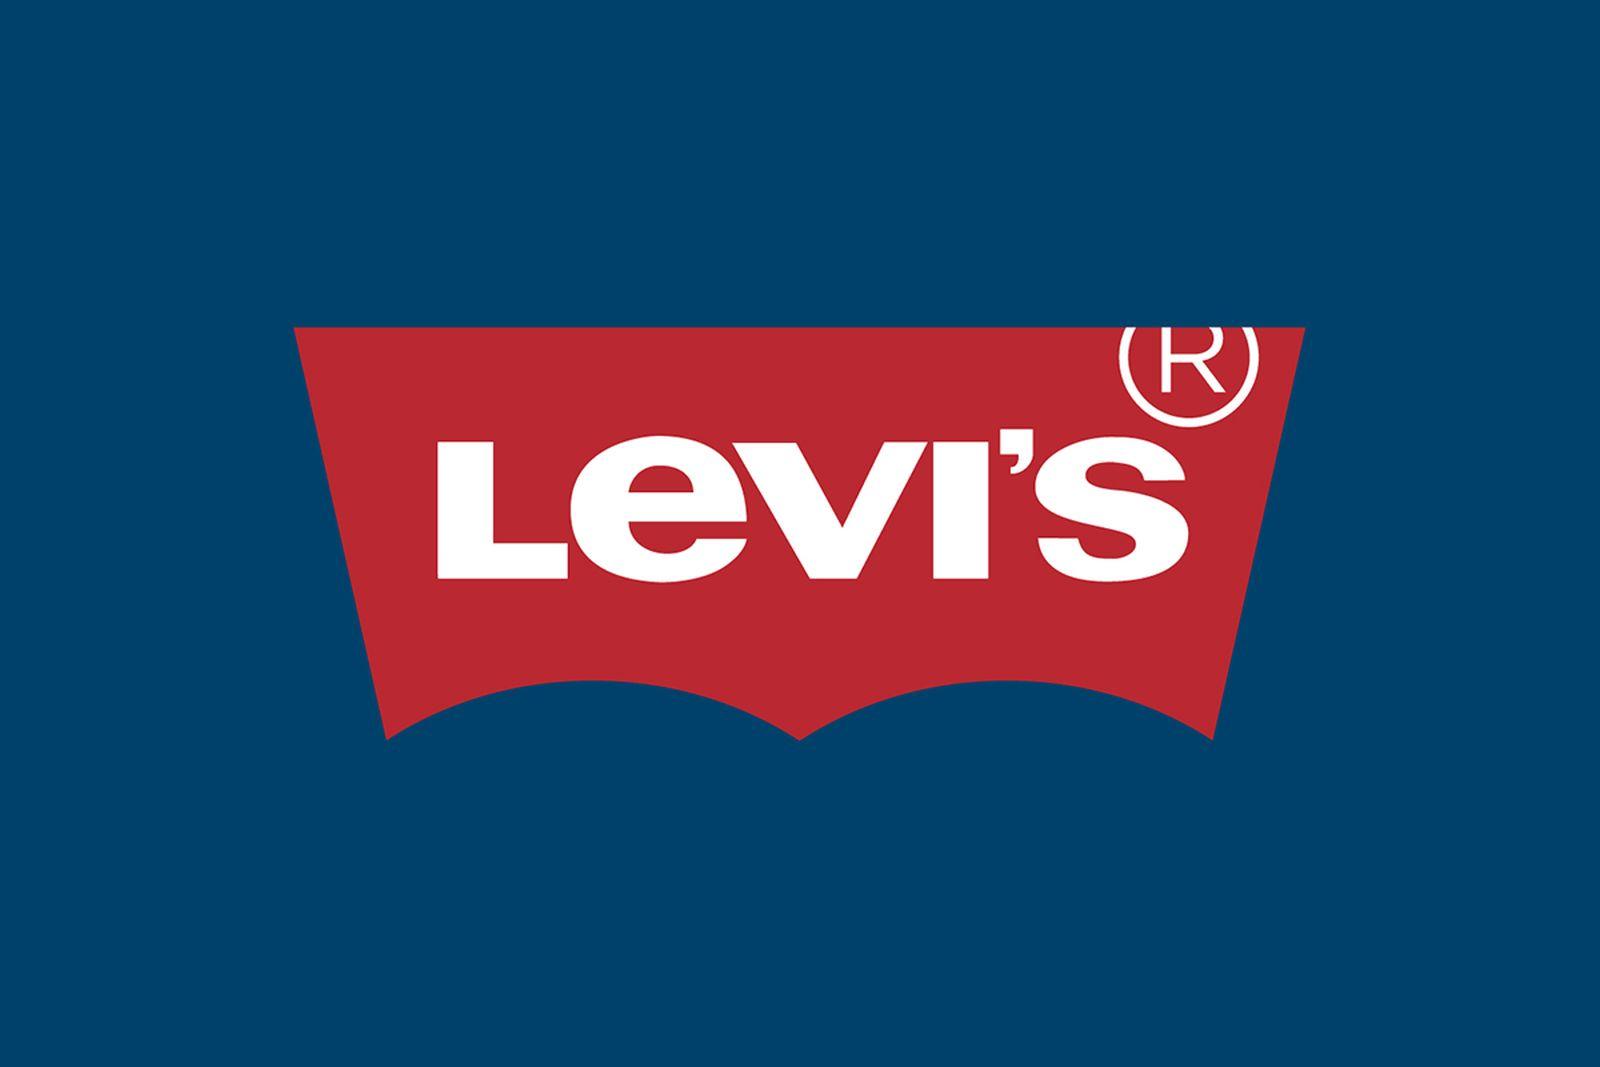 levis logo history Behind the Logo Levi's